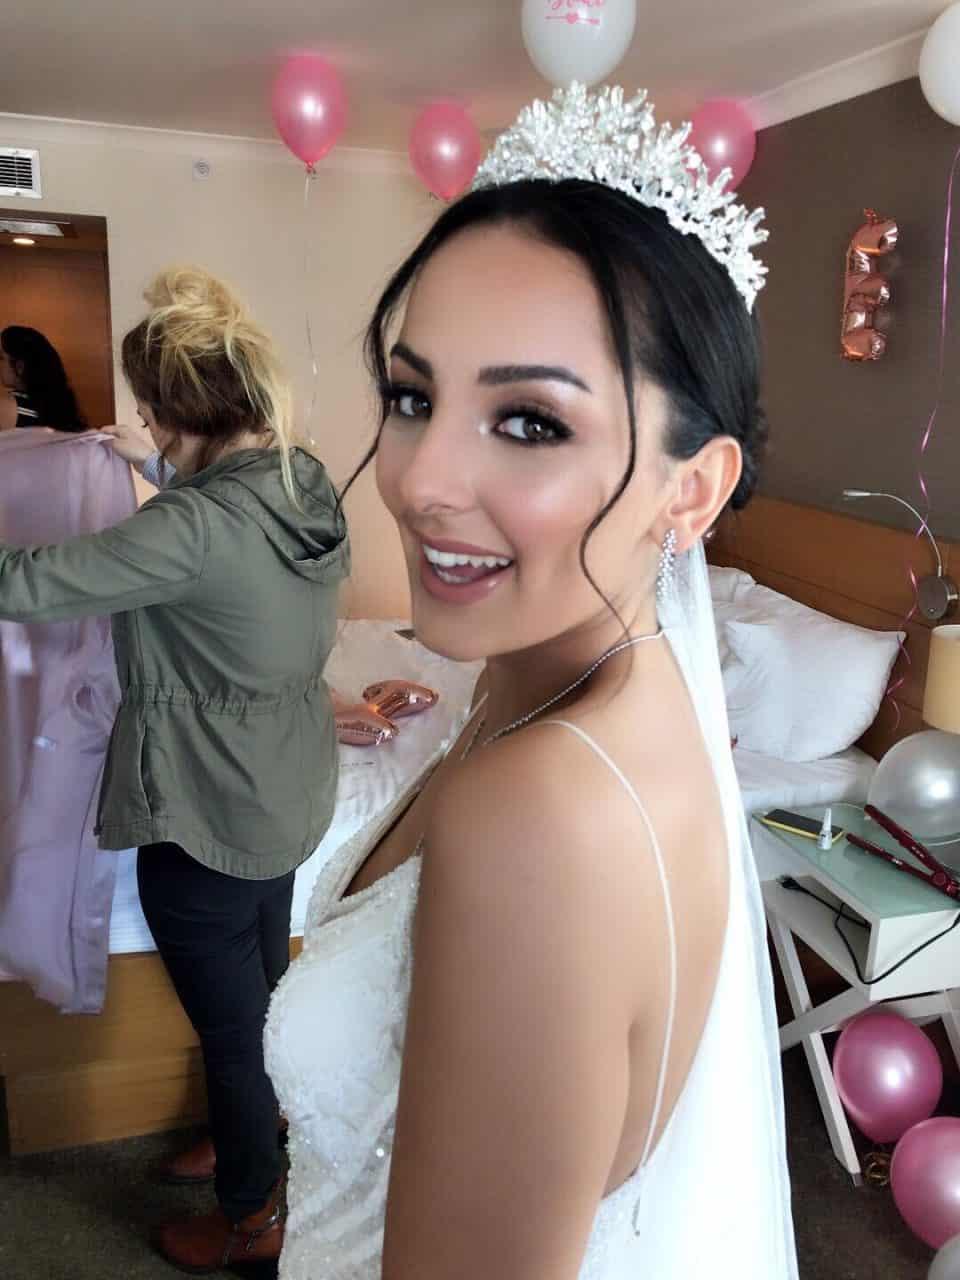 Make Up By Jeylo Kağıthane Makeup Fiyatları